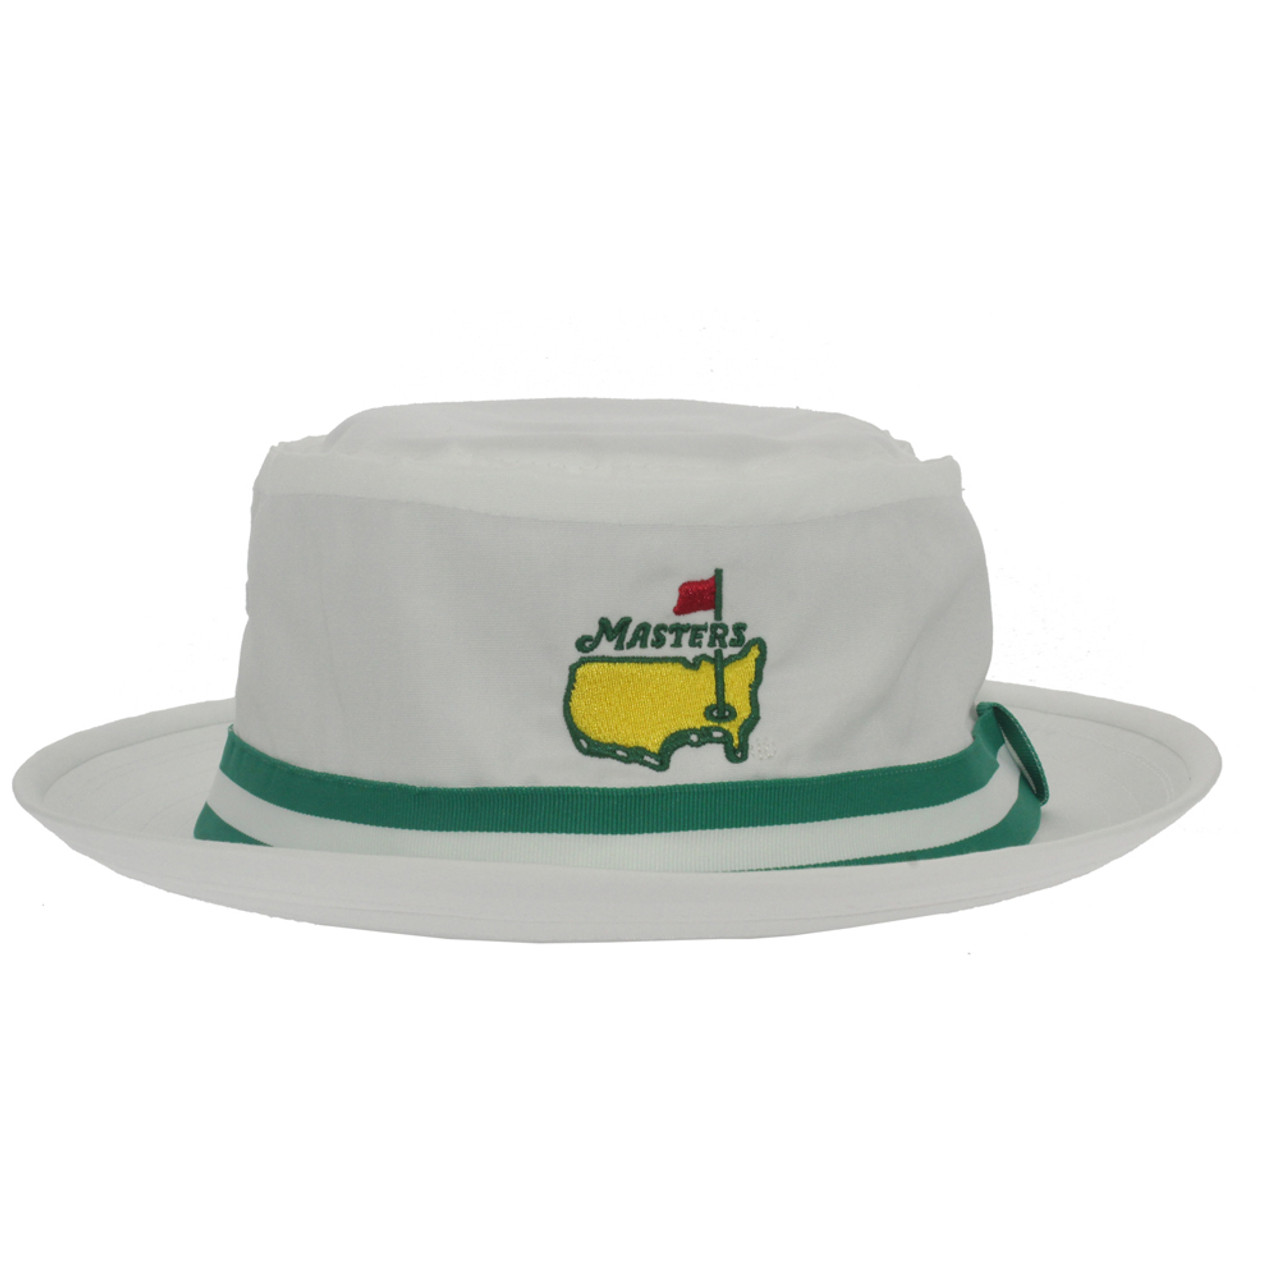 252d648d73b Masters White Bucket Hat - Masters Hats   Visors